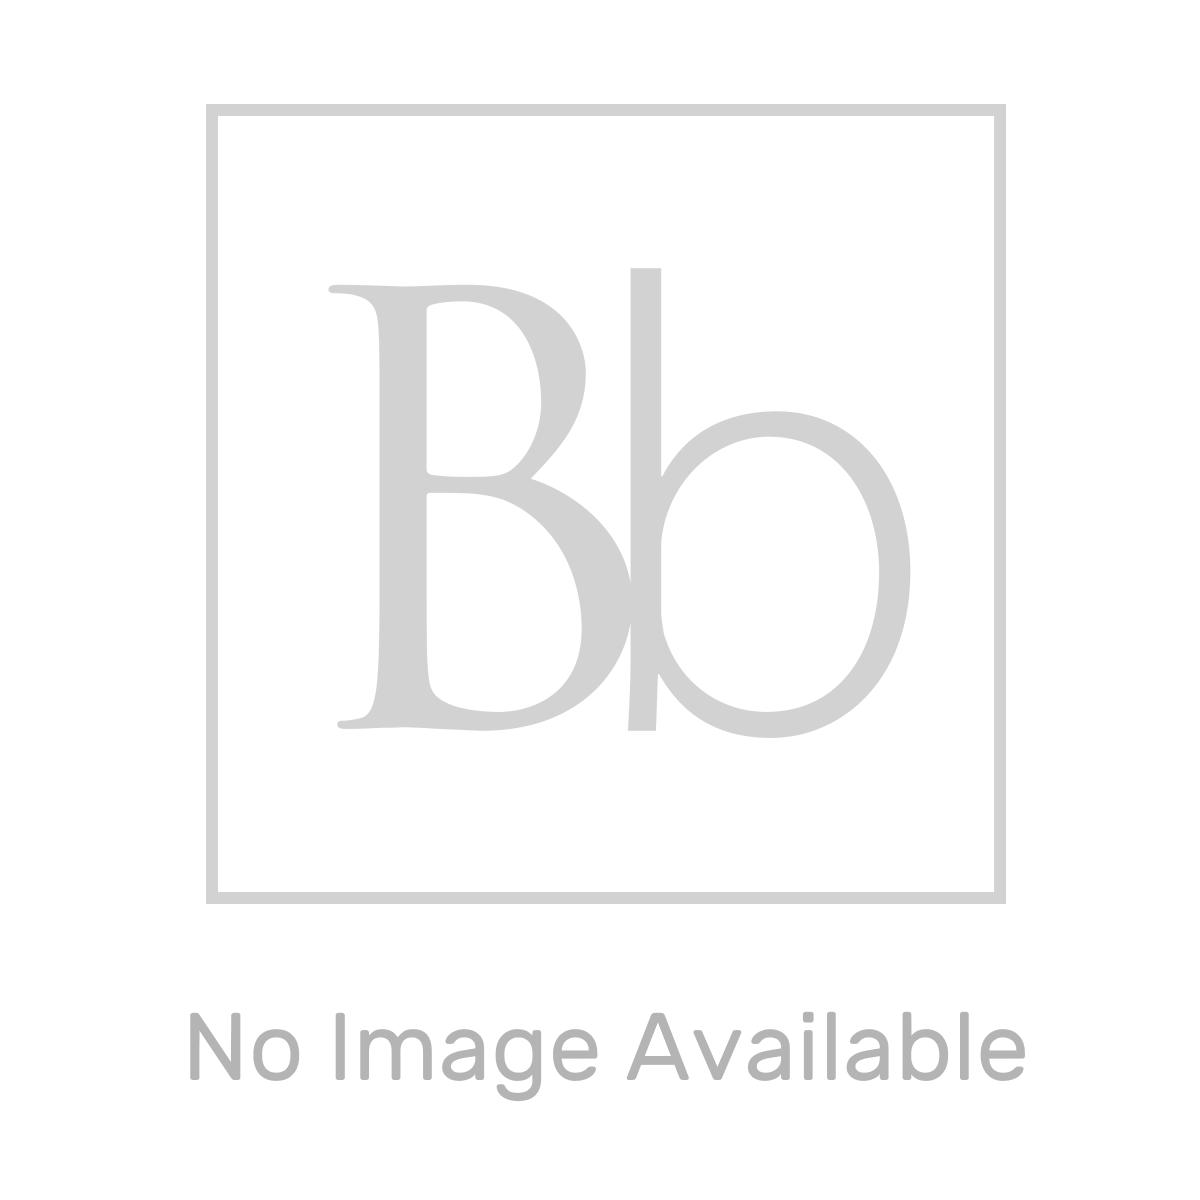 RAK Precious Uni Dark Black Wall Hung Counter Basin with Brackets